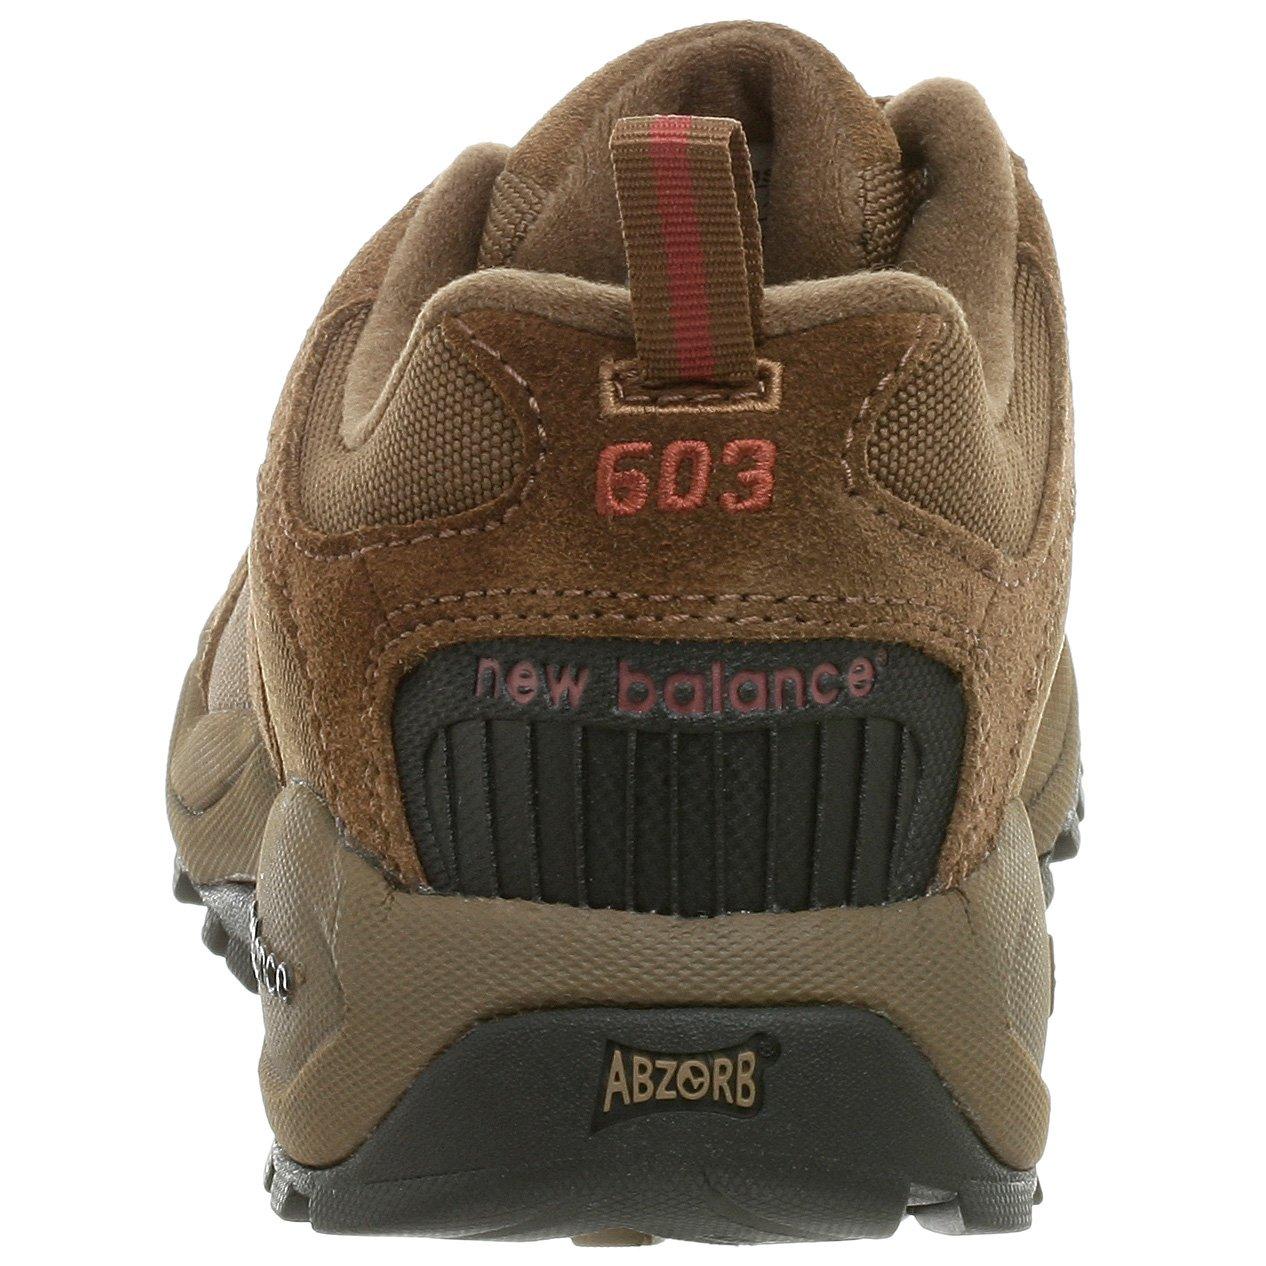 meilleures baskets 48882 e8206 Amazon.com   New Balance Men's MW603 Walking Shoe, Brown ...